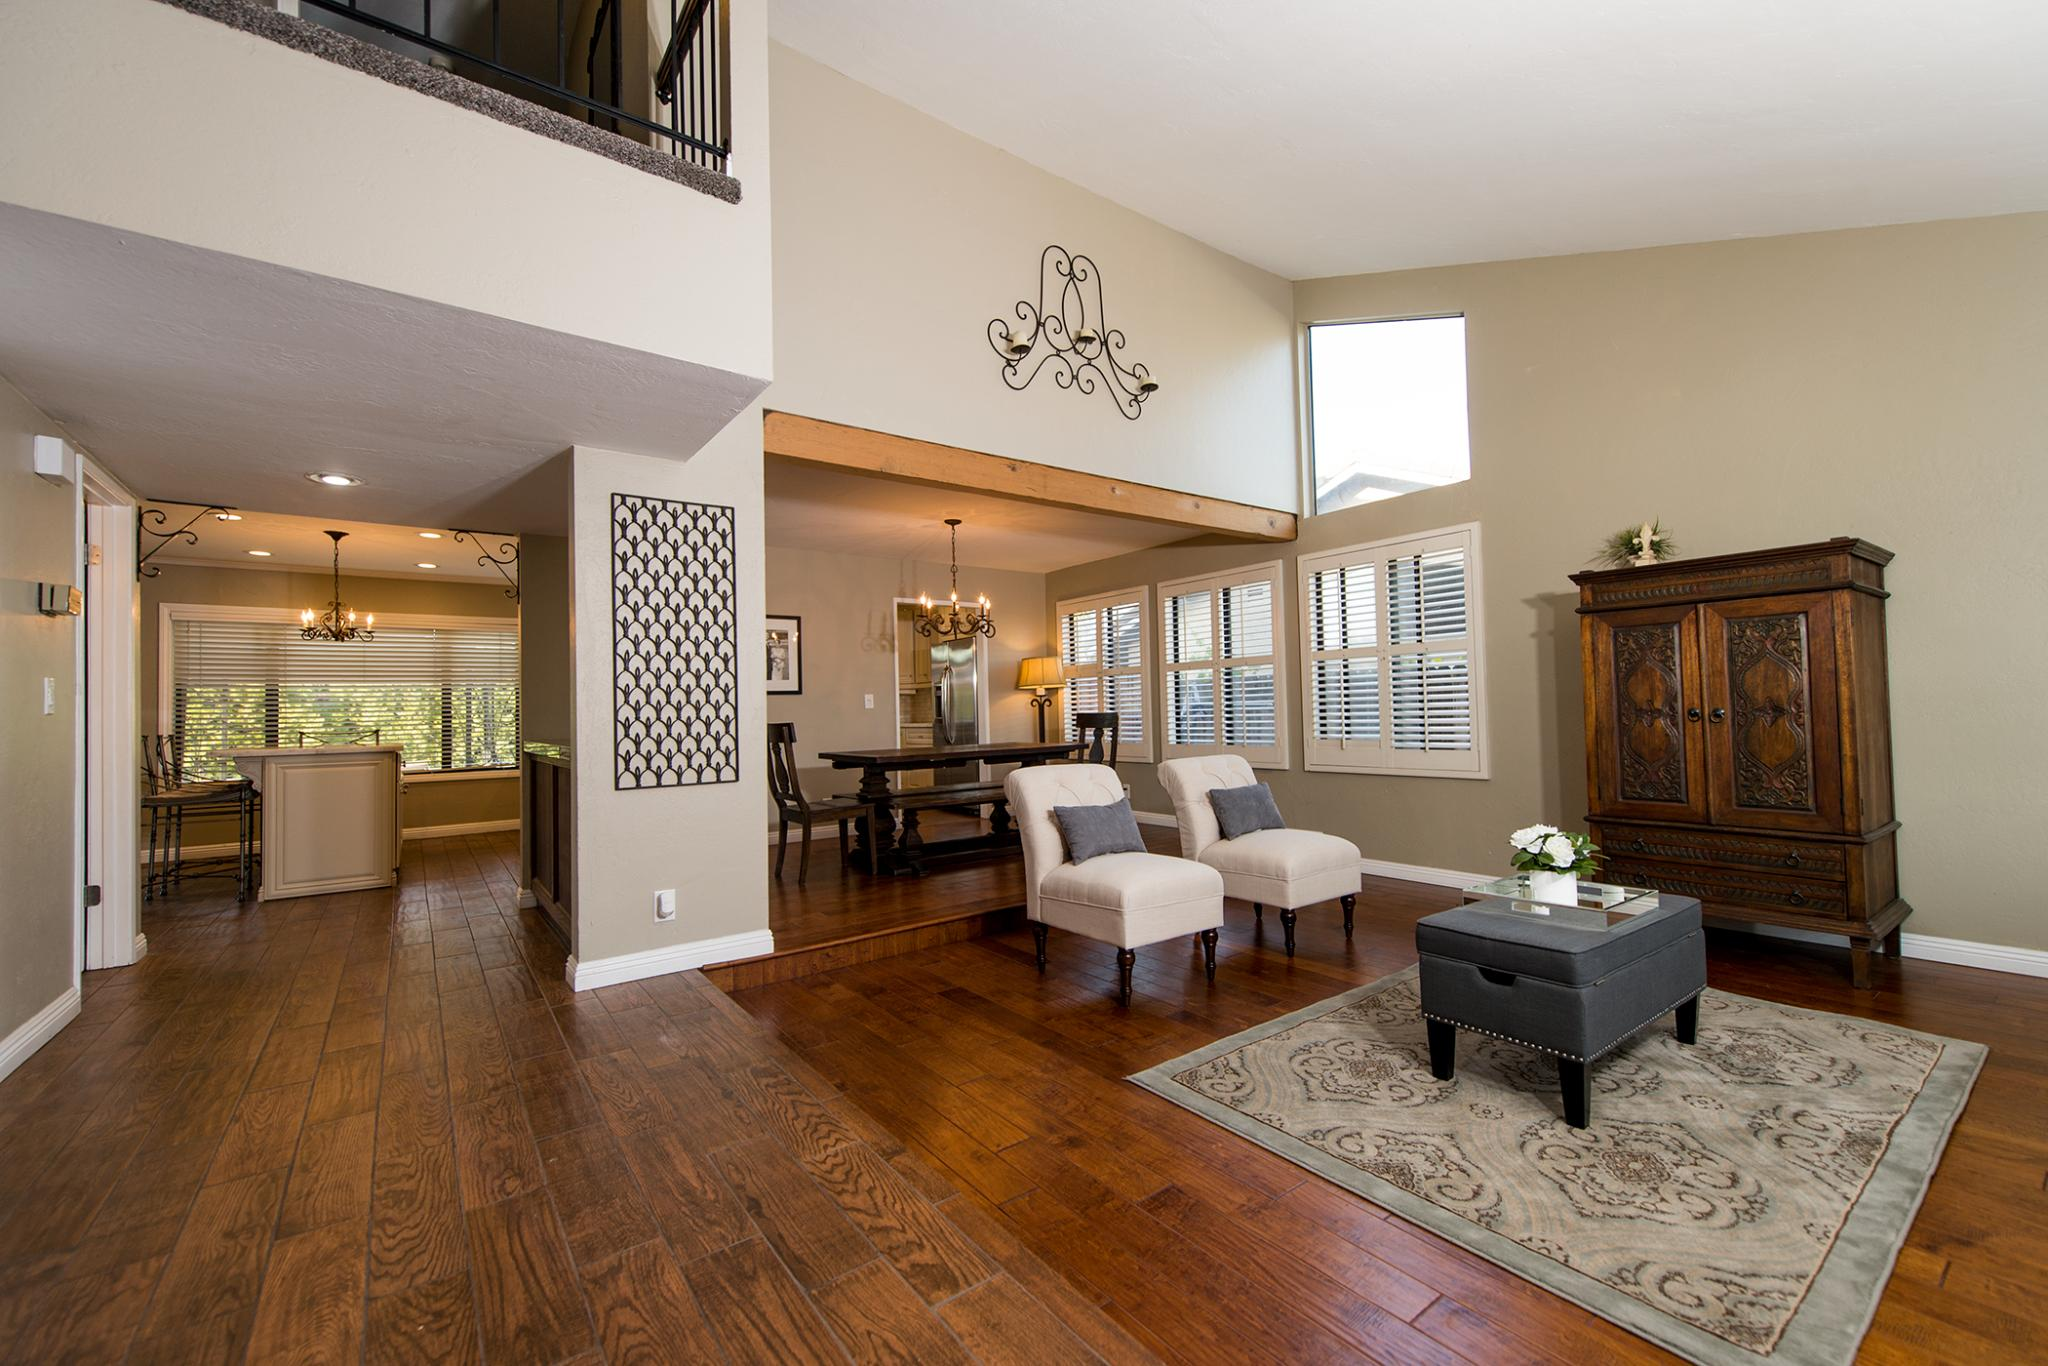 4463 Leatherwood St. 4463 Leatherwood St  Camarillo  CA 93012   Estimate and Home